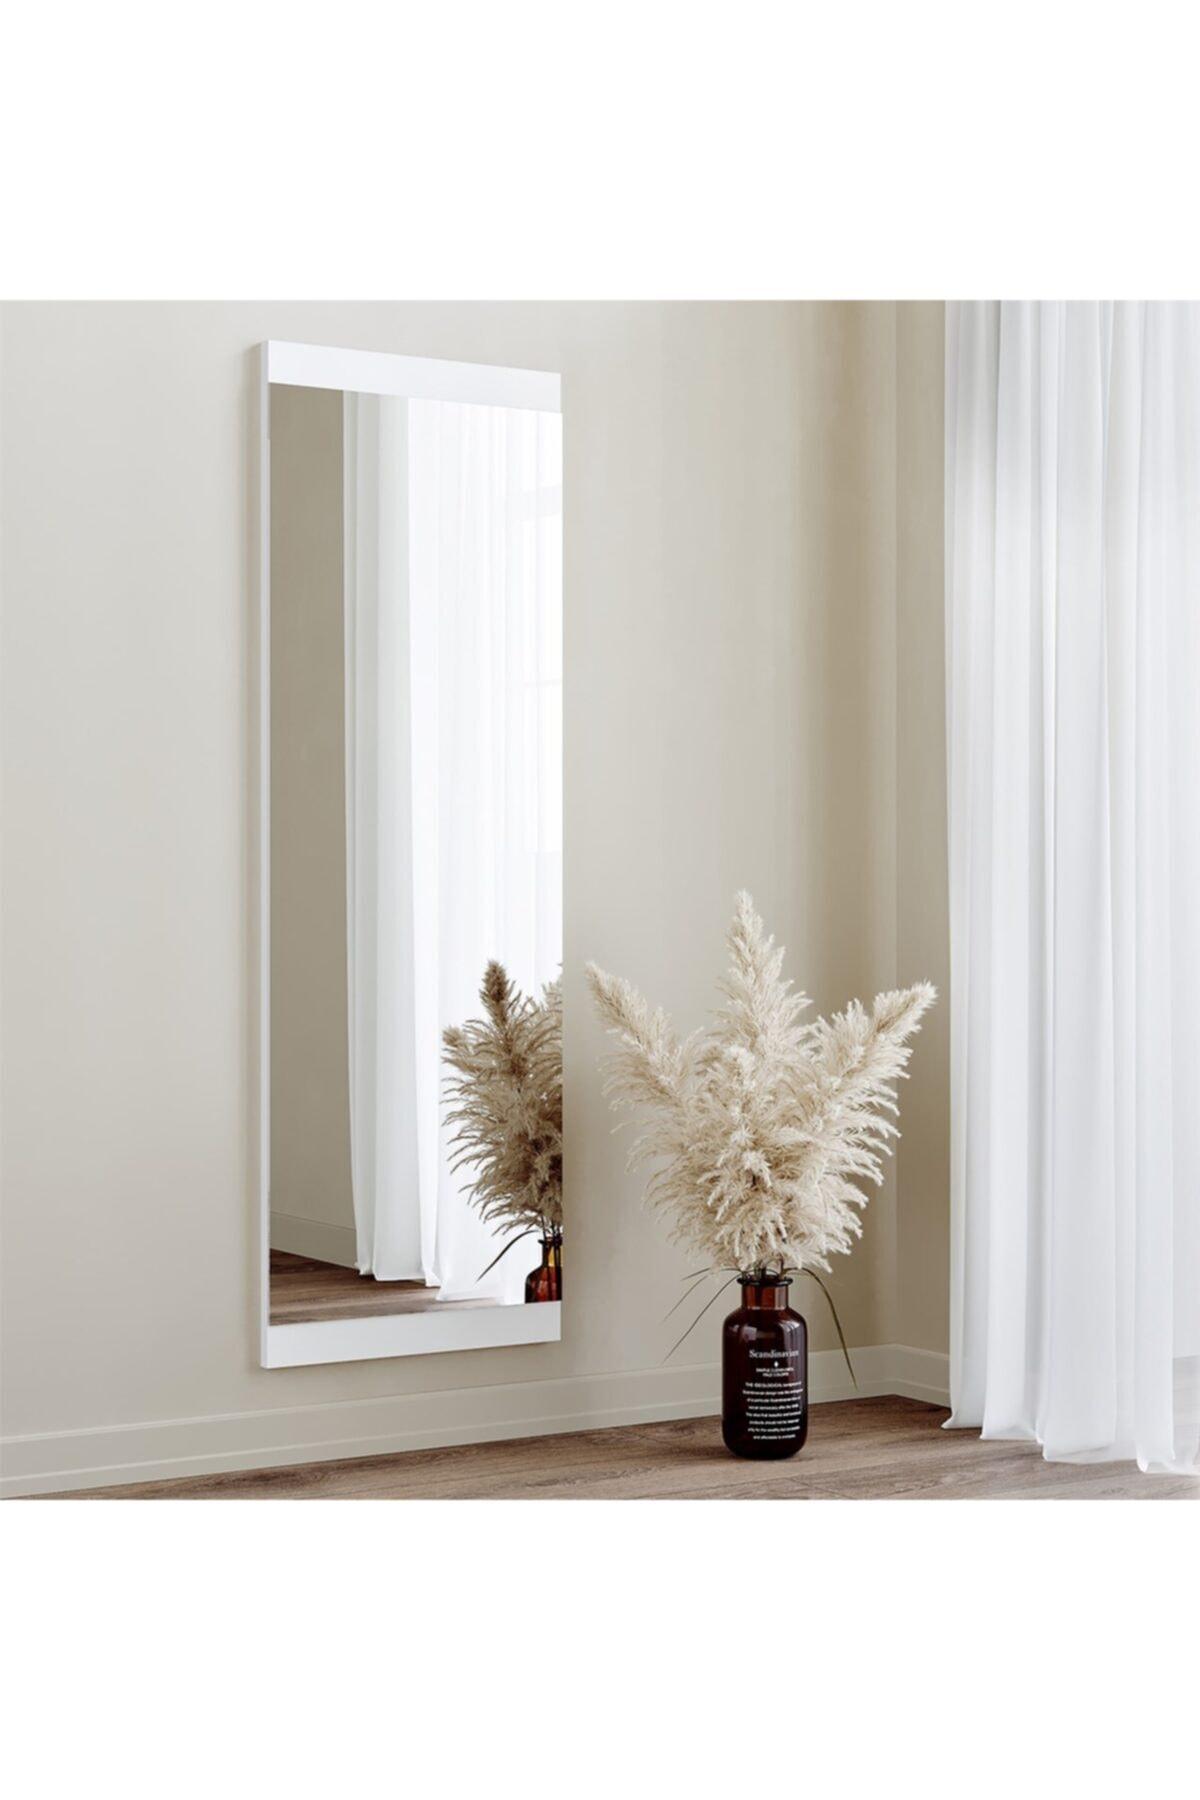 NEOstill Boy Aynası Dekoratif Basic 40x120 cm 1